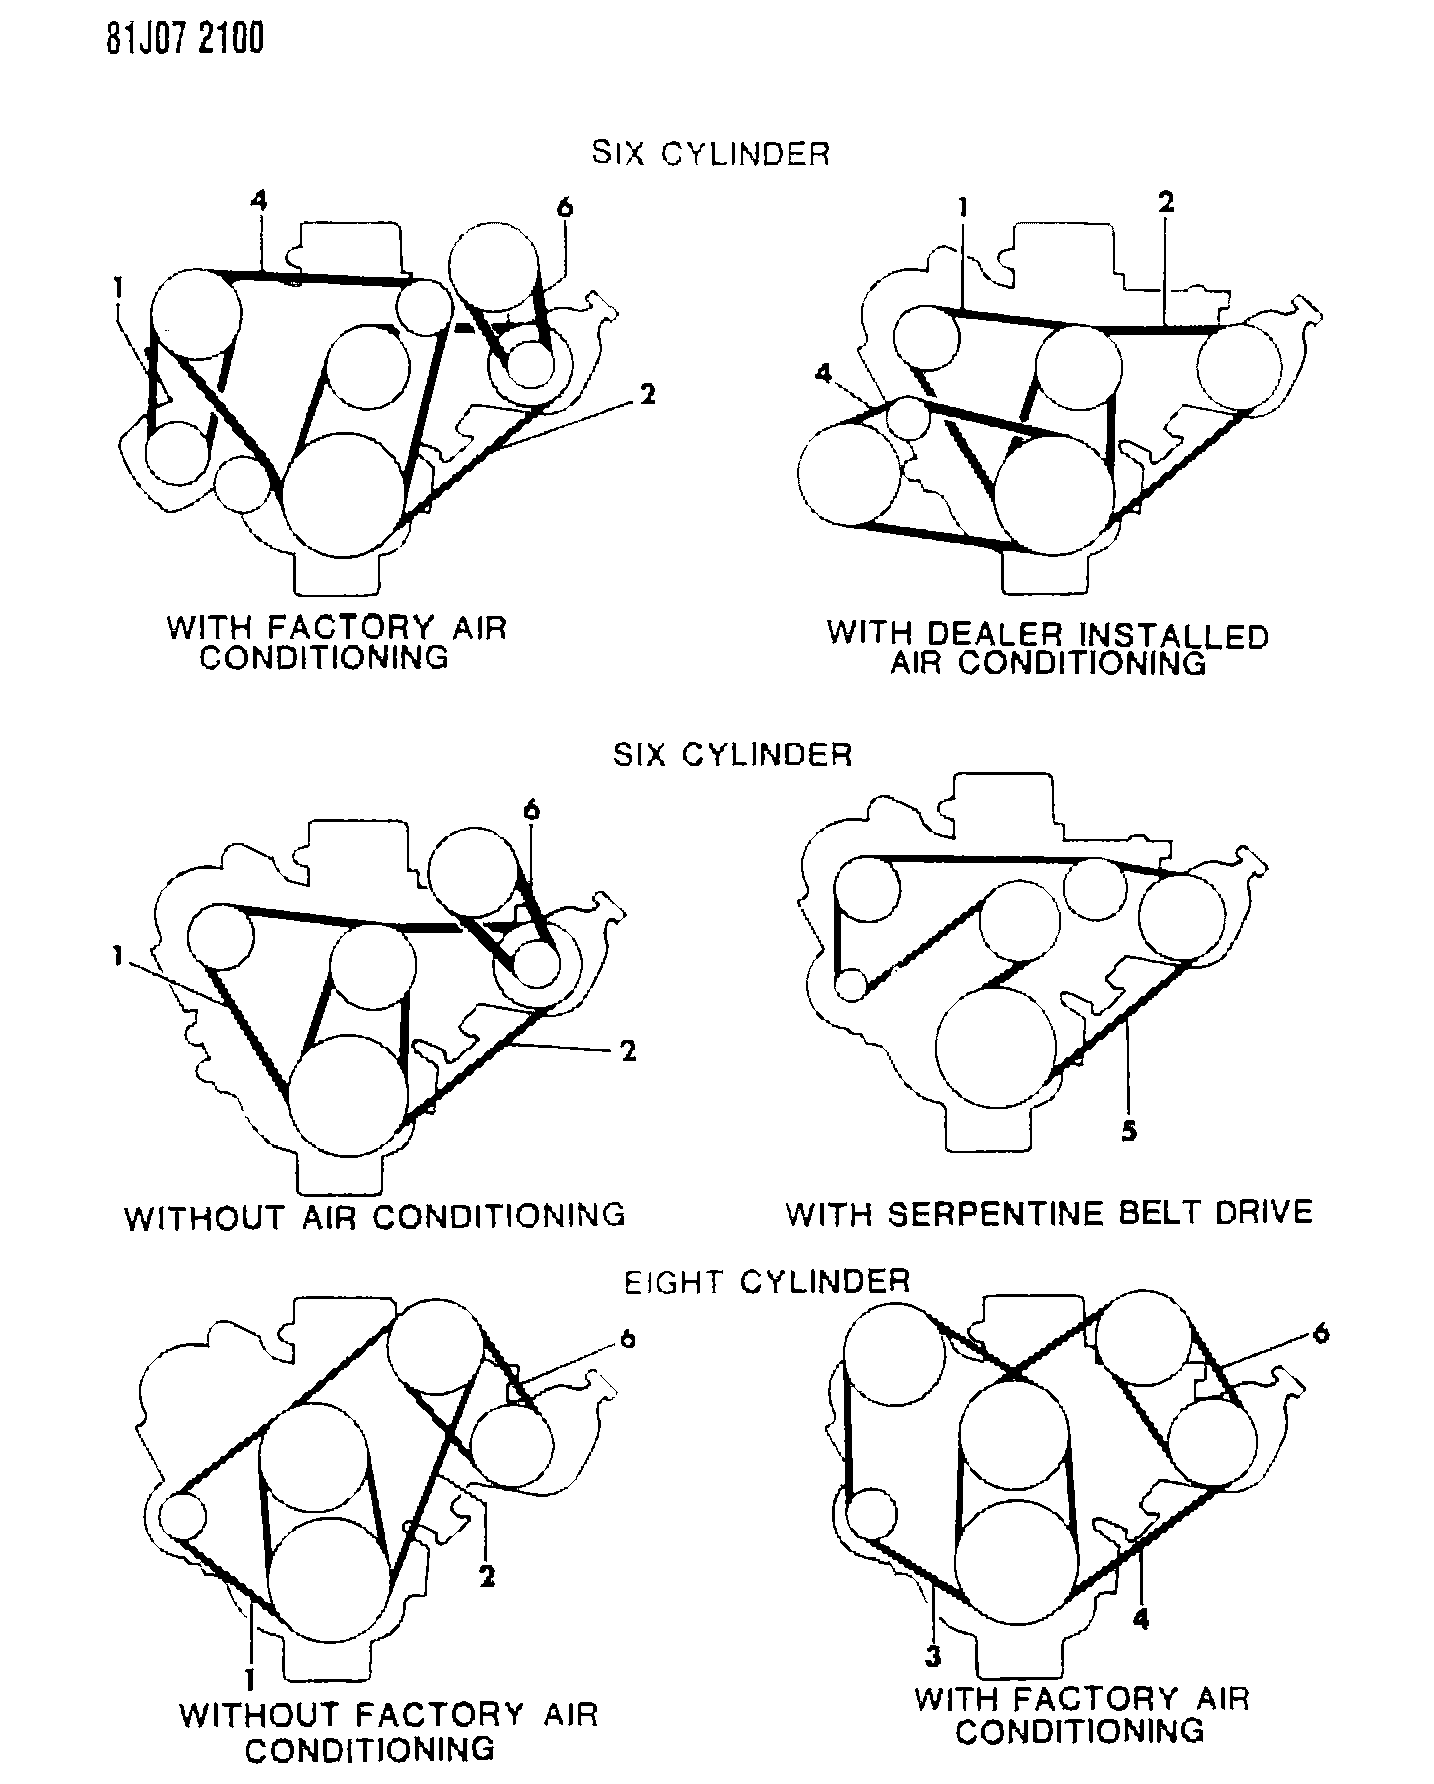 wiring diagram for cj8 10 8 tierarztpraxis ruffy de Gint Robt Transfromer ci catcar info chrysler 2017 07 4f2481 162278 rh 18 13 batarms game de 2013 polaris atv wiring diagram intellichlor transformer wiring diagram for